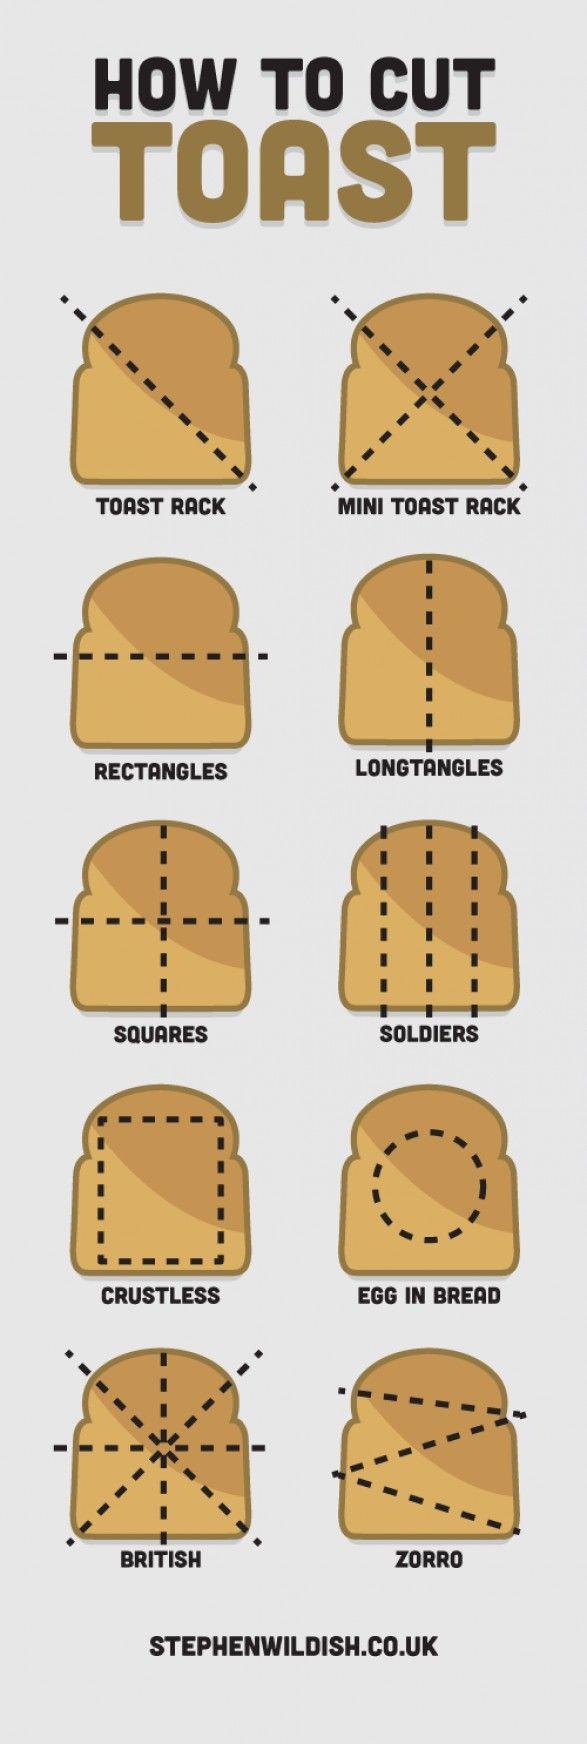 How To Cut Toast By Stephenwildish Via Foodbeast #infographic #toast